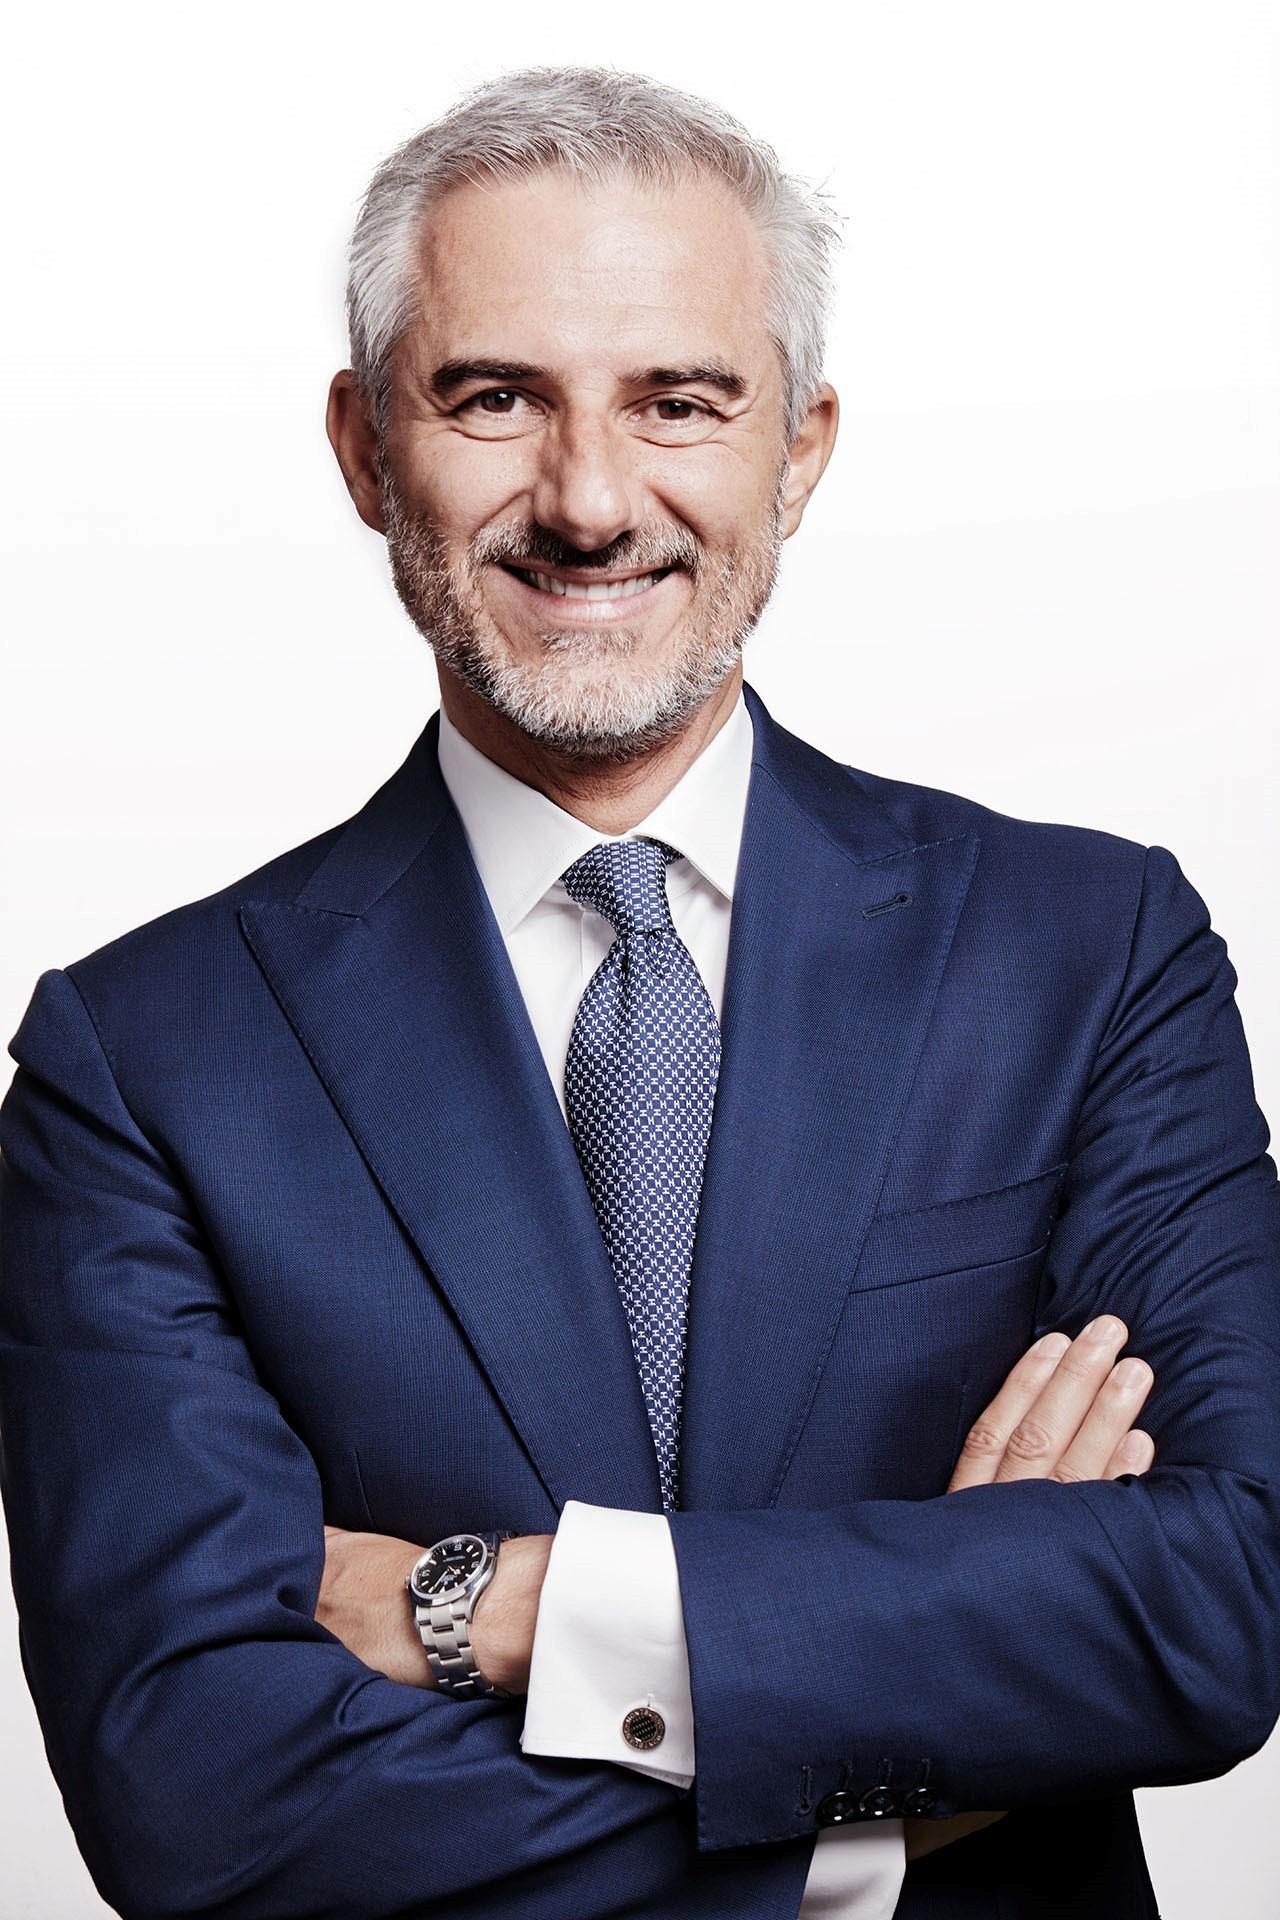 RICCARDO SERRINI - Funding & Capital Markets Forum 2018